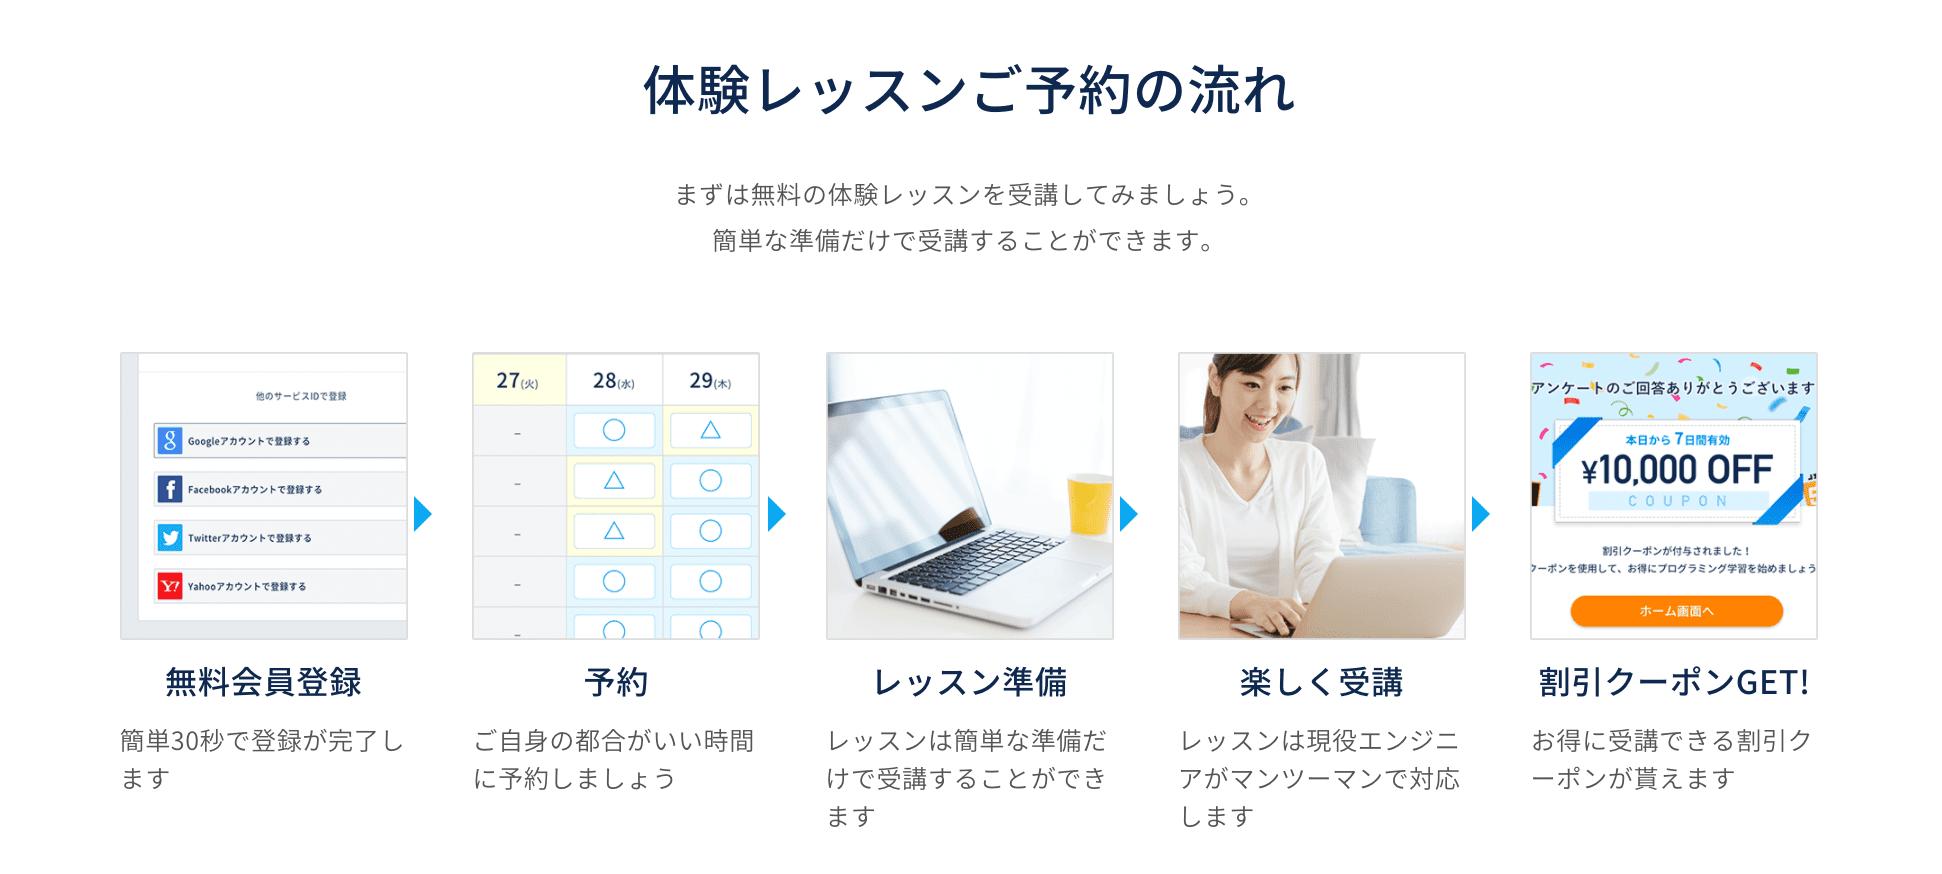 CodeCamp